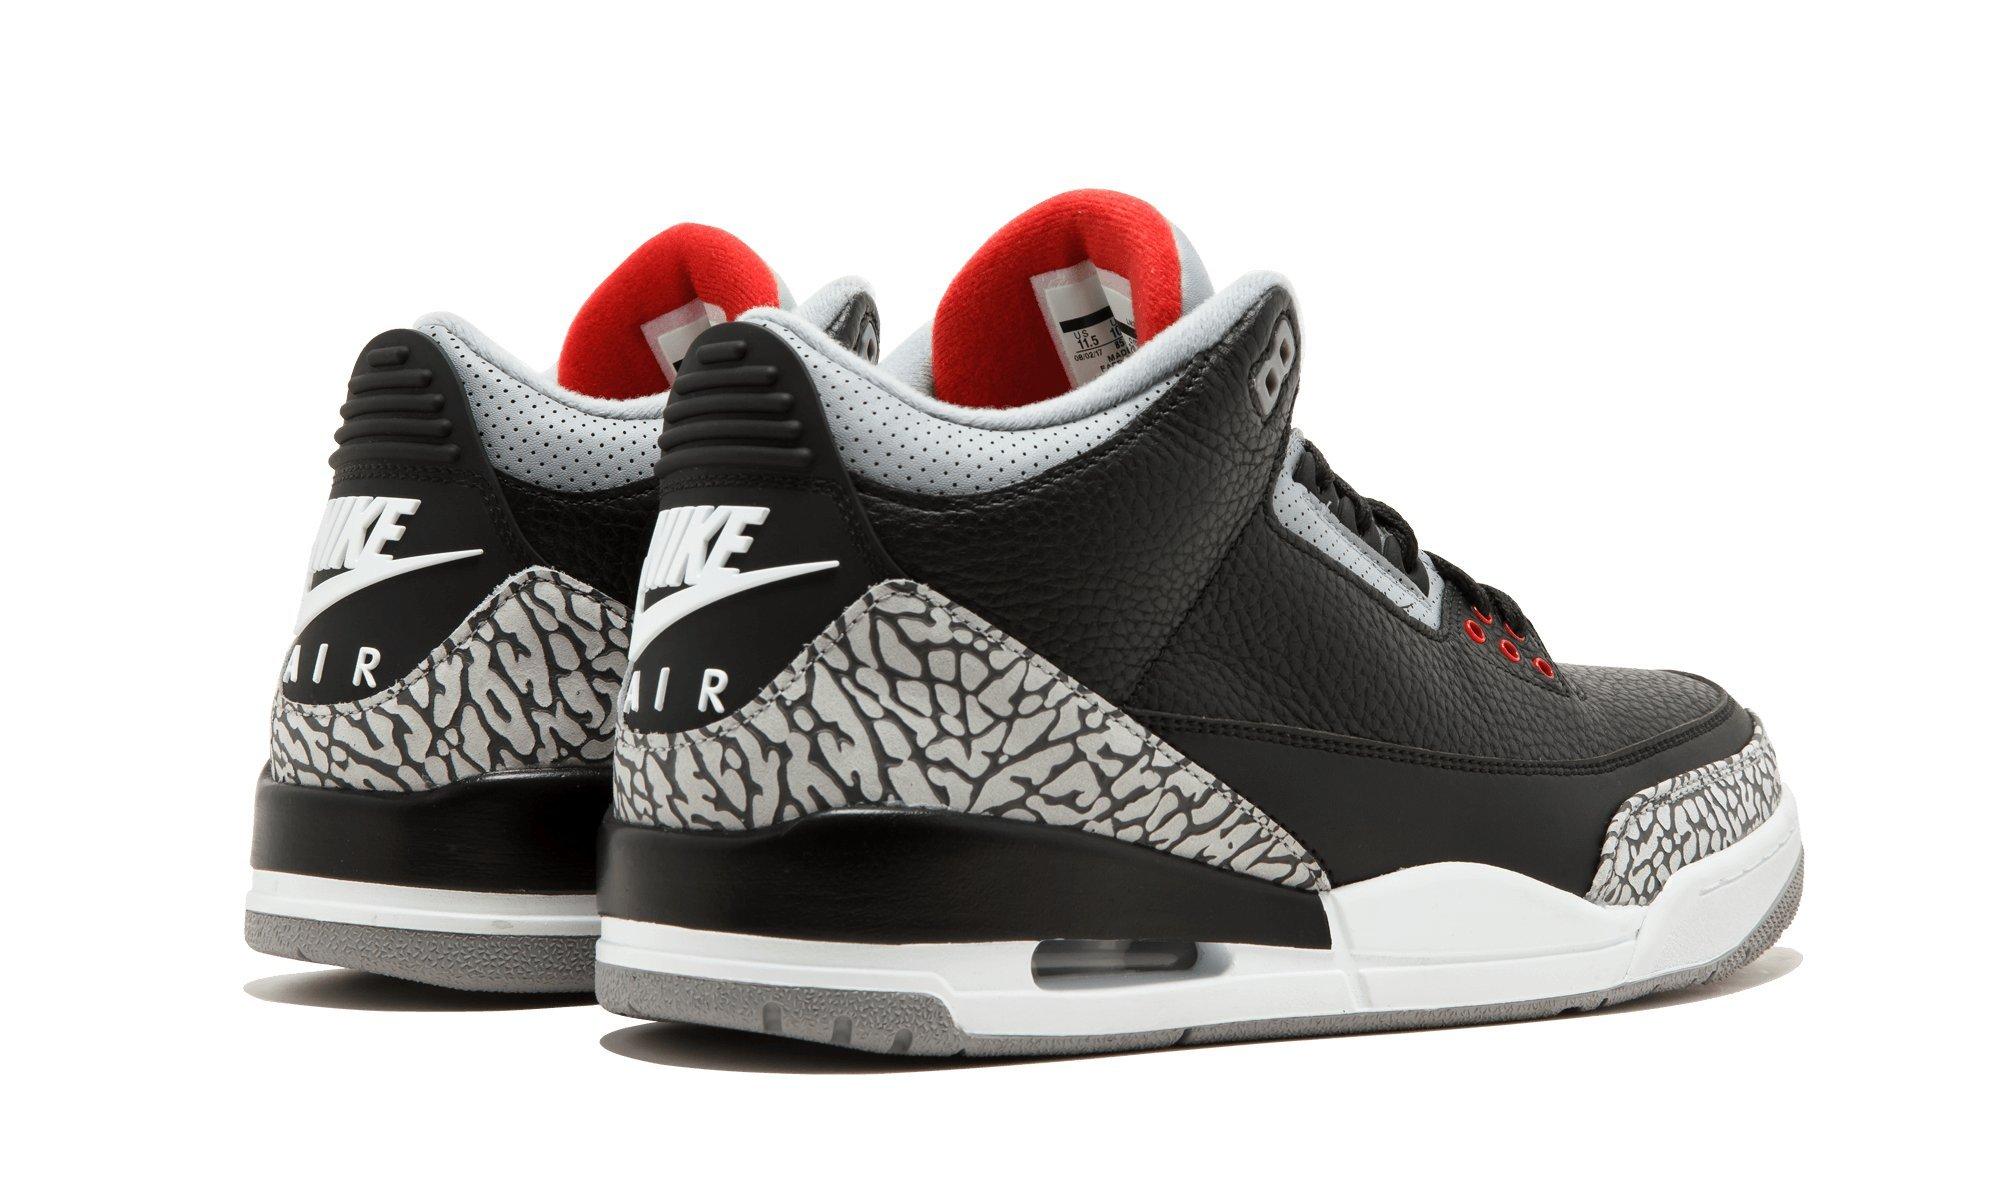 best sneakers f58a7 2bad2 Air Jordan 3 Retro